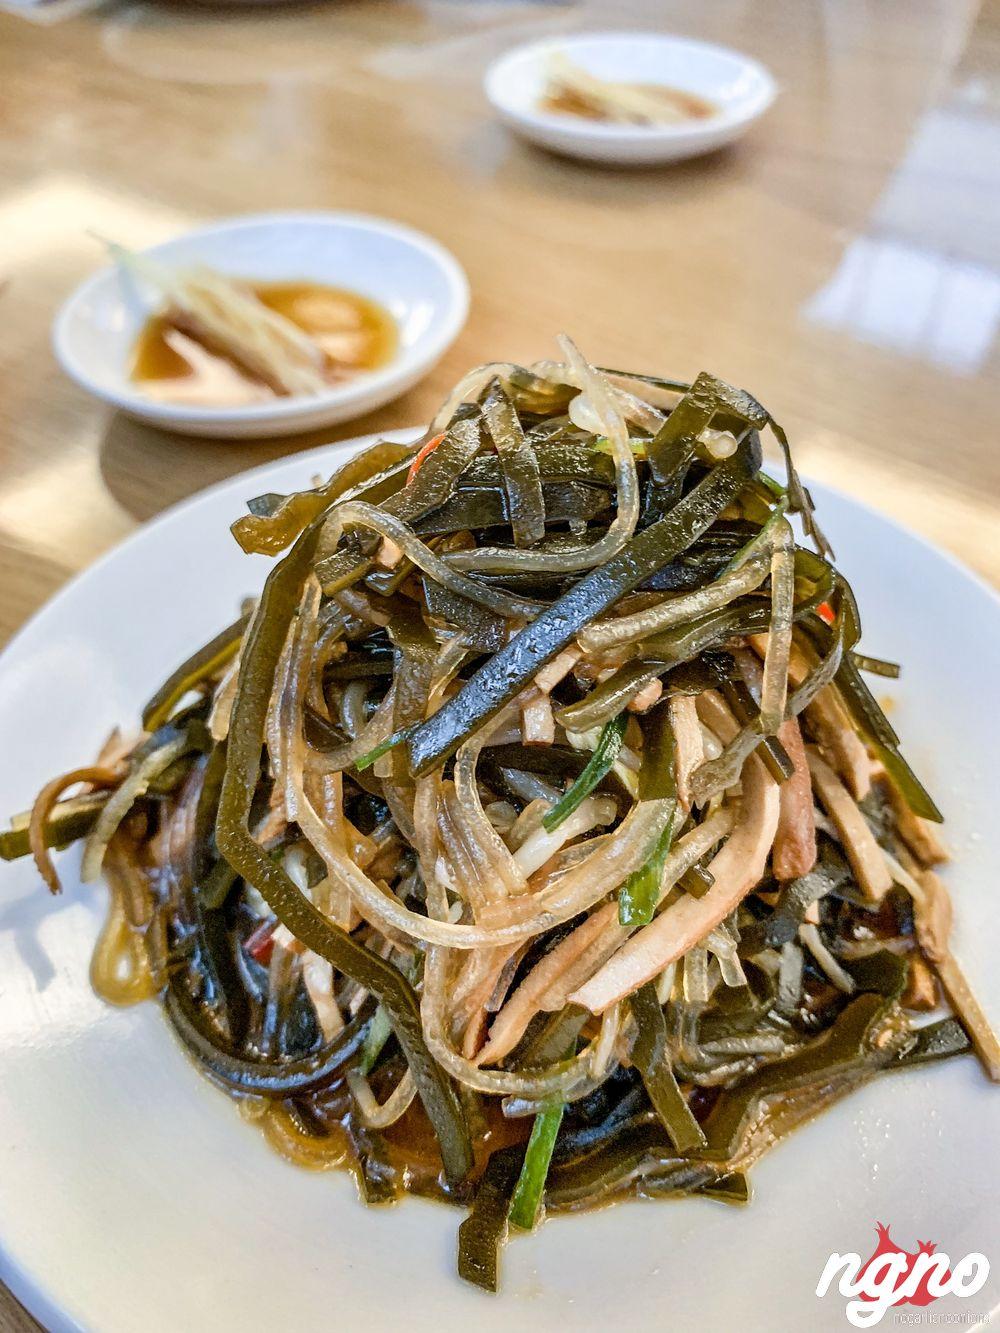 din-tai-fung-dubai-food-nogarlicnoonions-352018-11-23-07-01-26